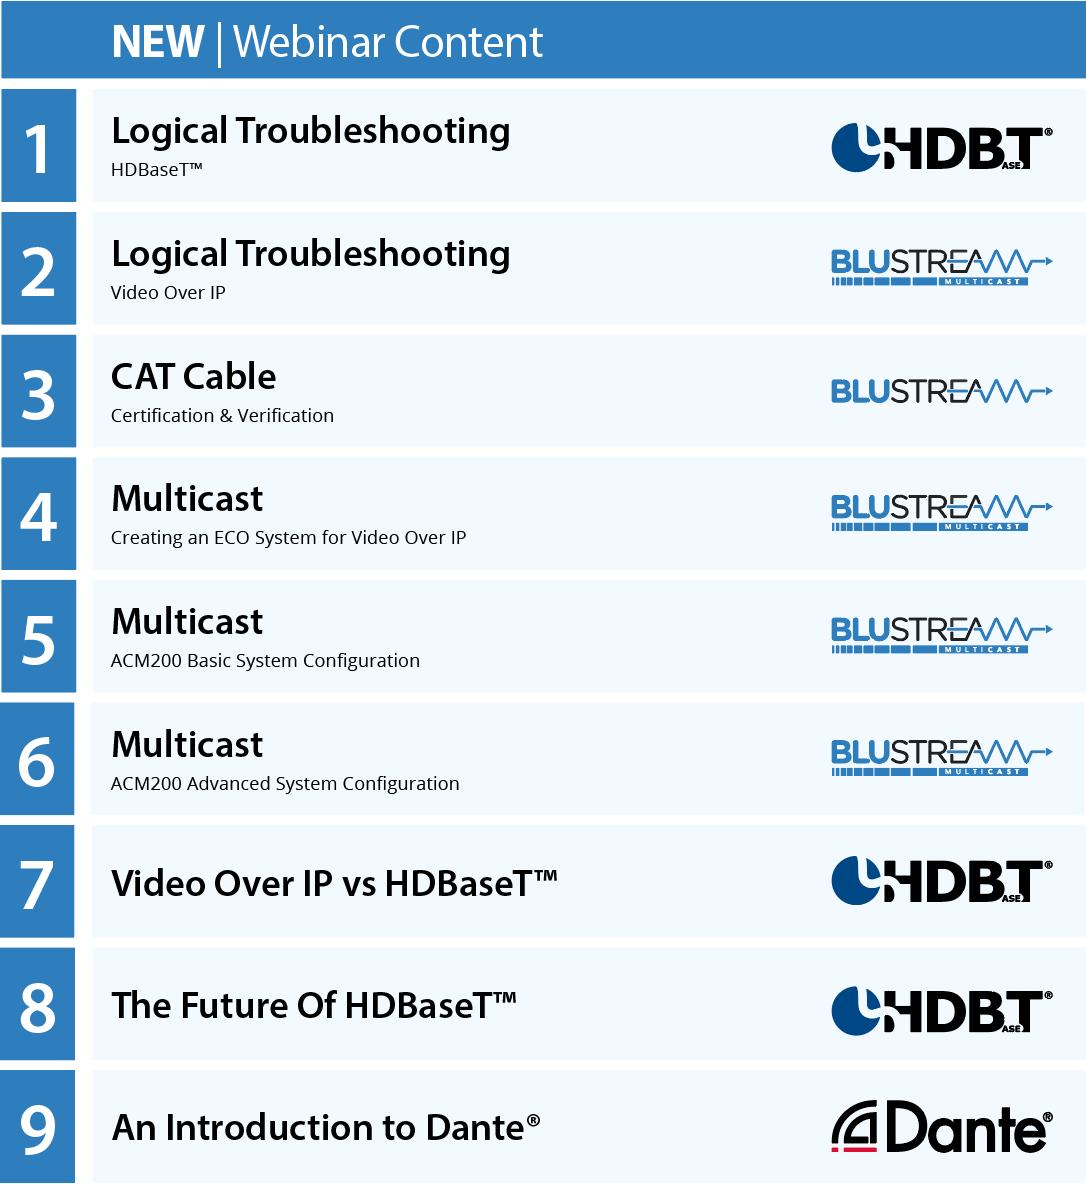 Webinar Content Table